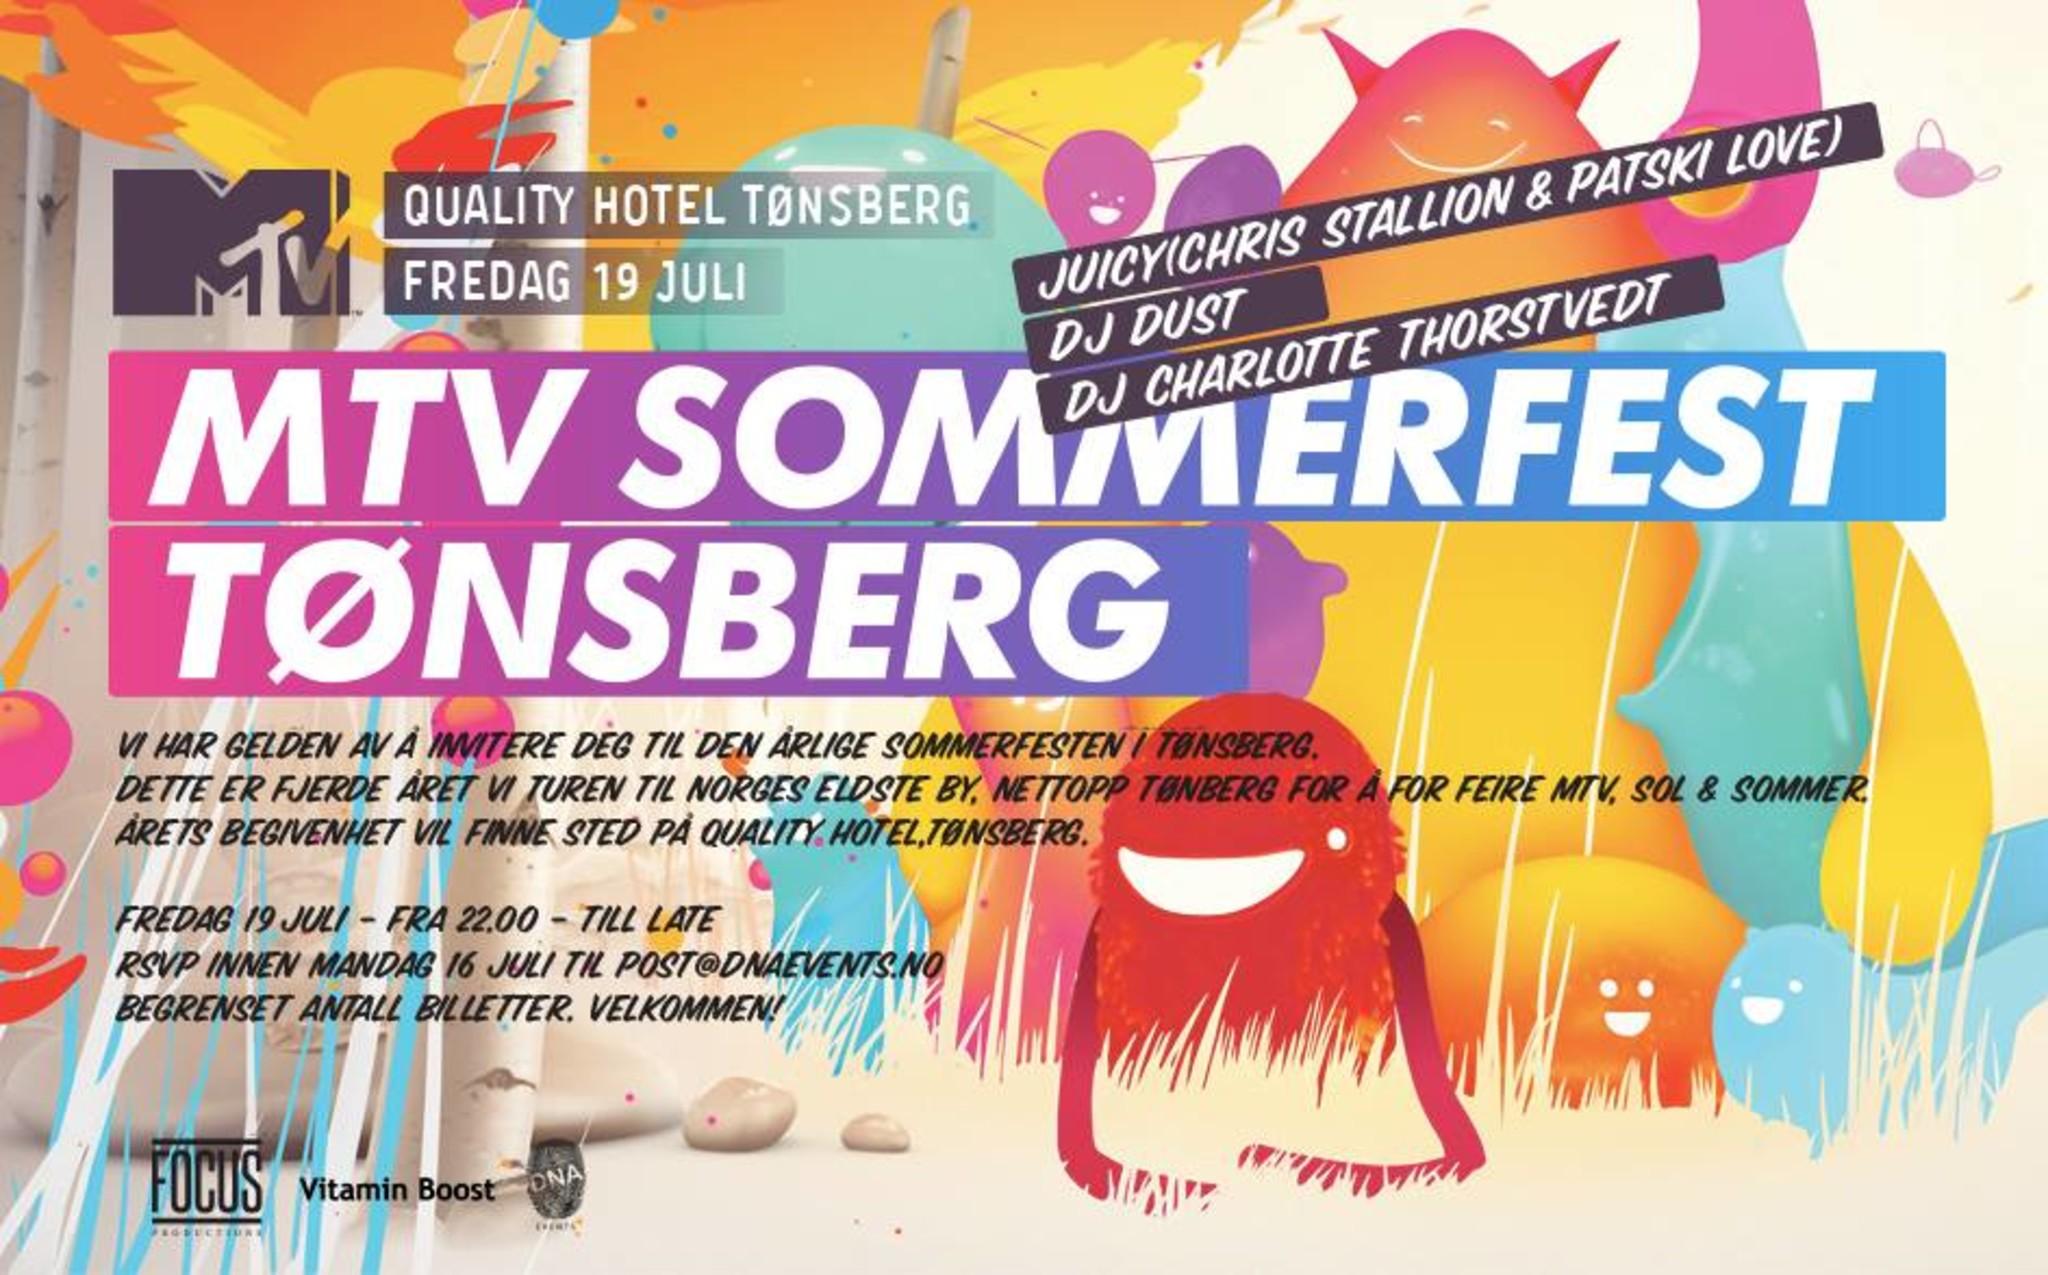 hotell quality tønsberg